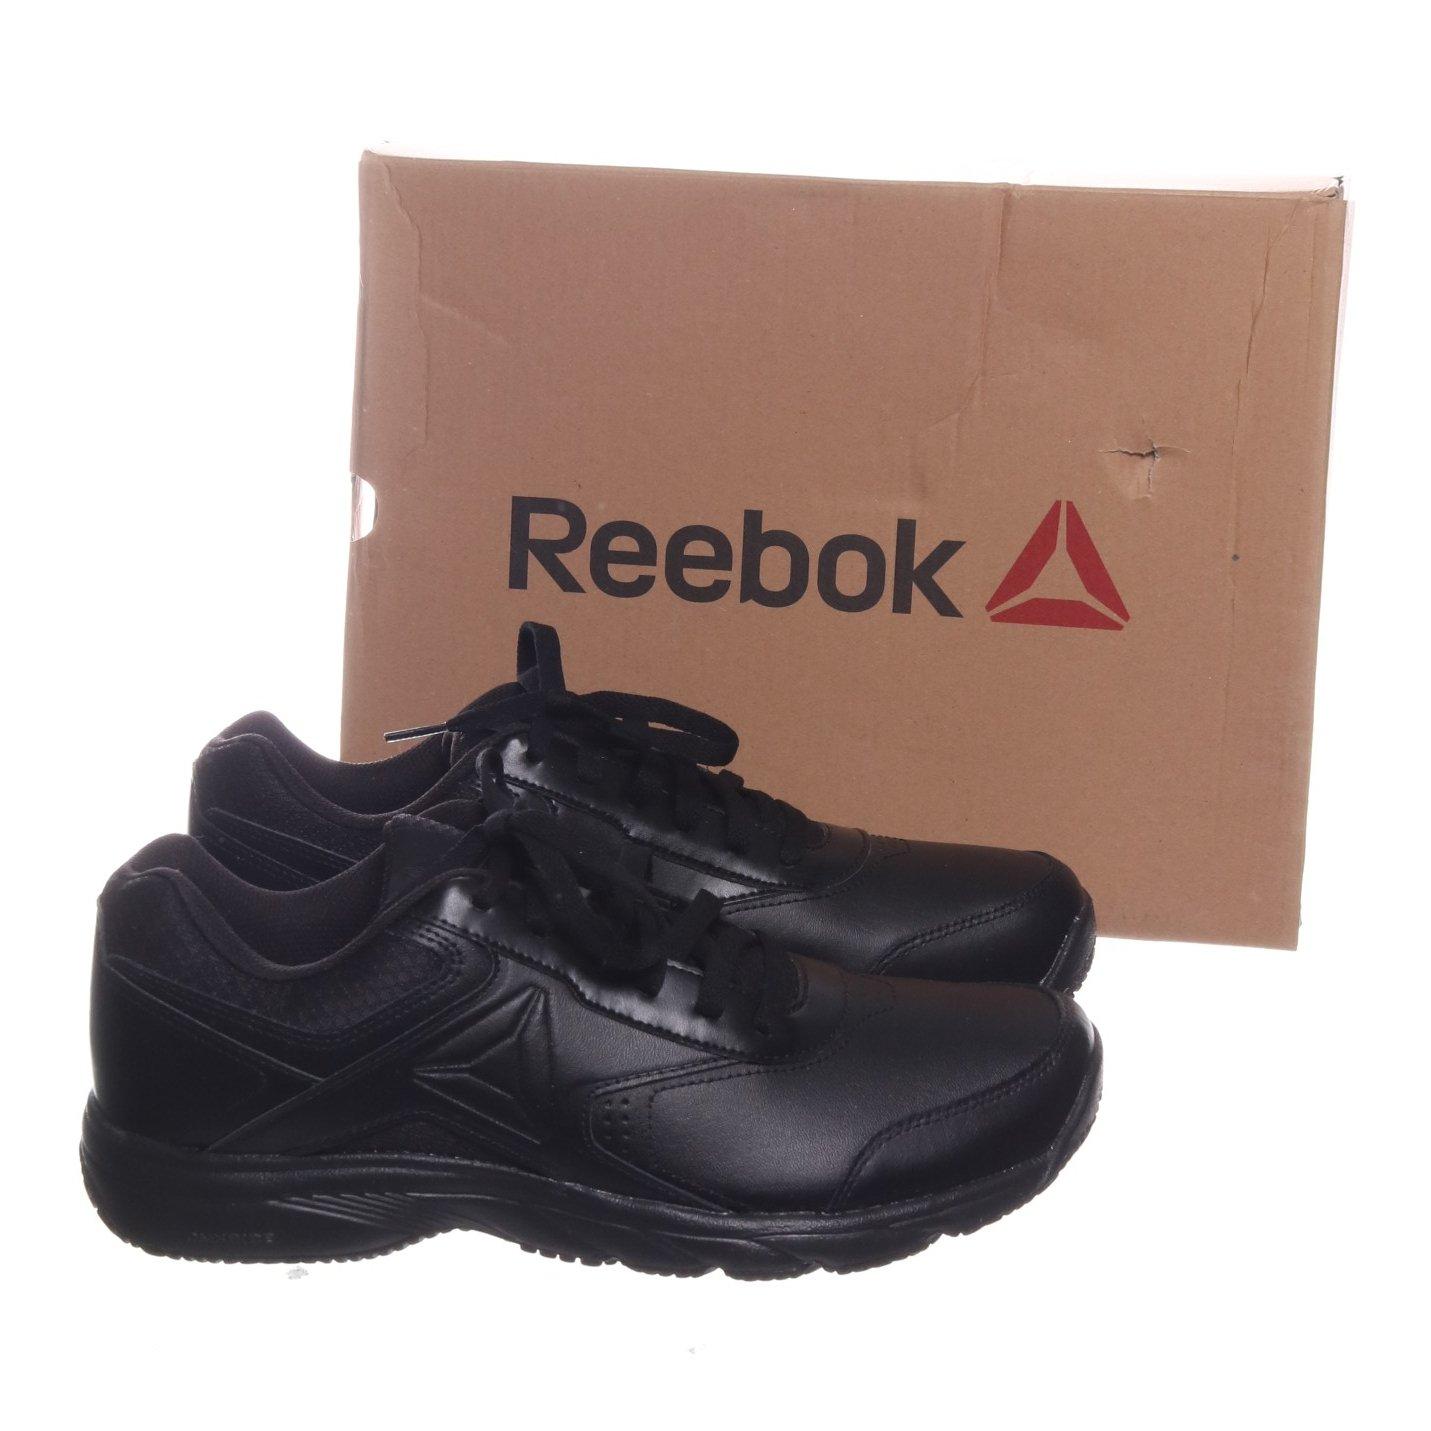 Reebok, Sneakers, Strl: 43, Work n Cushion 3.0, Svart, Skinn